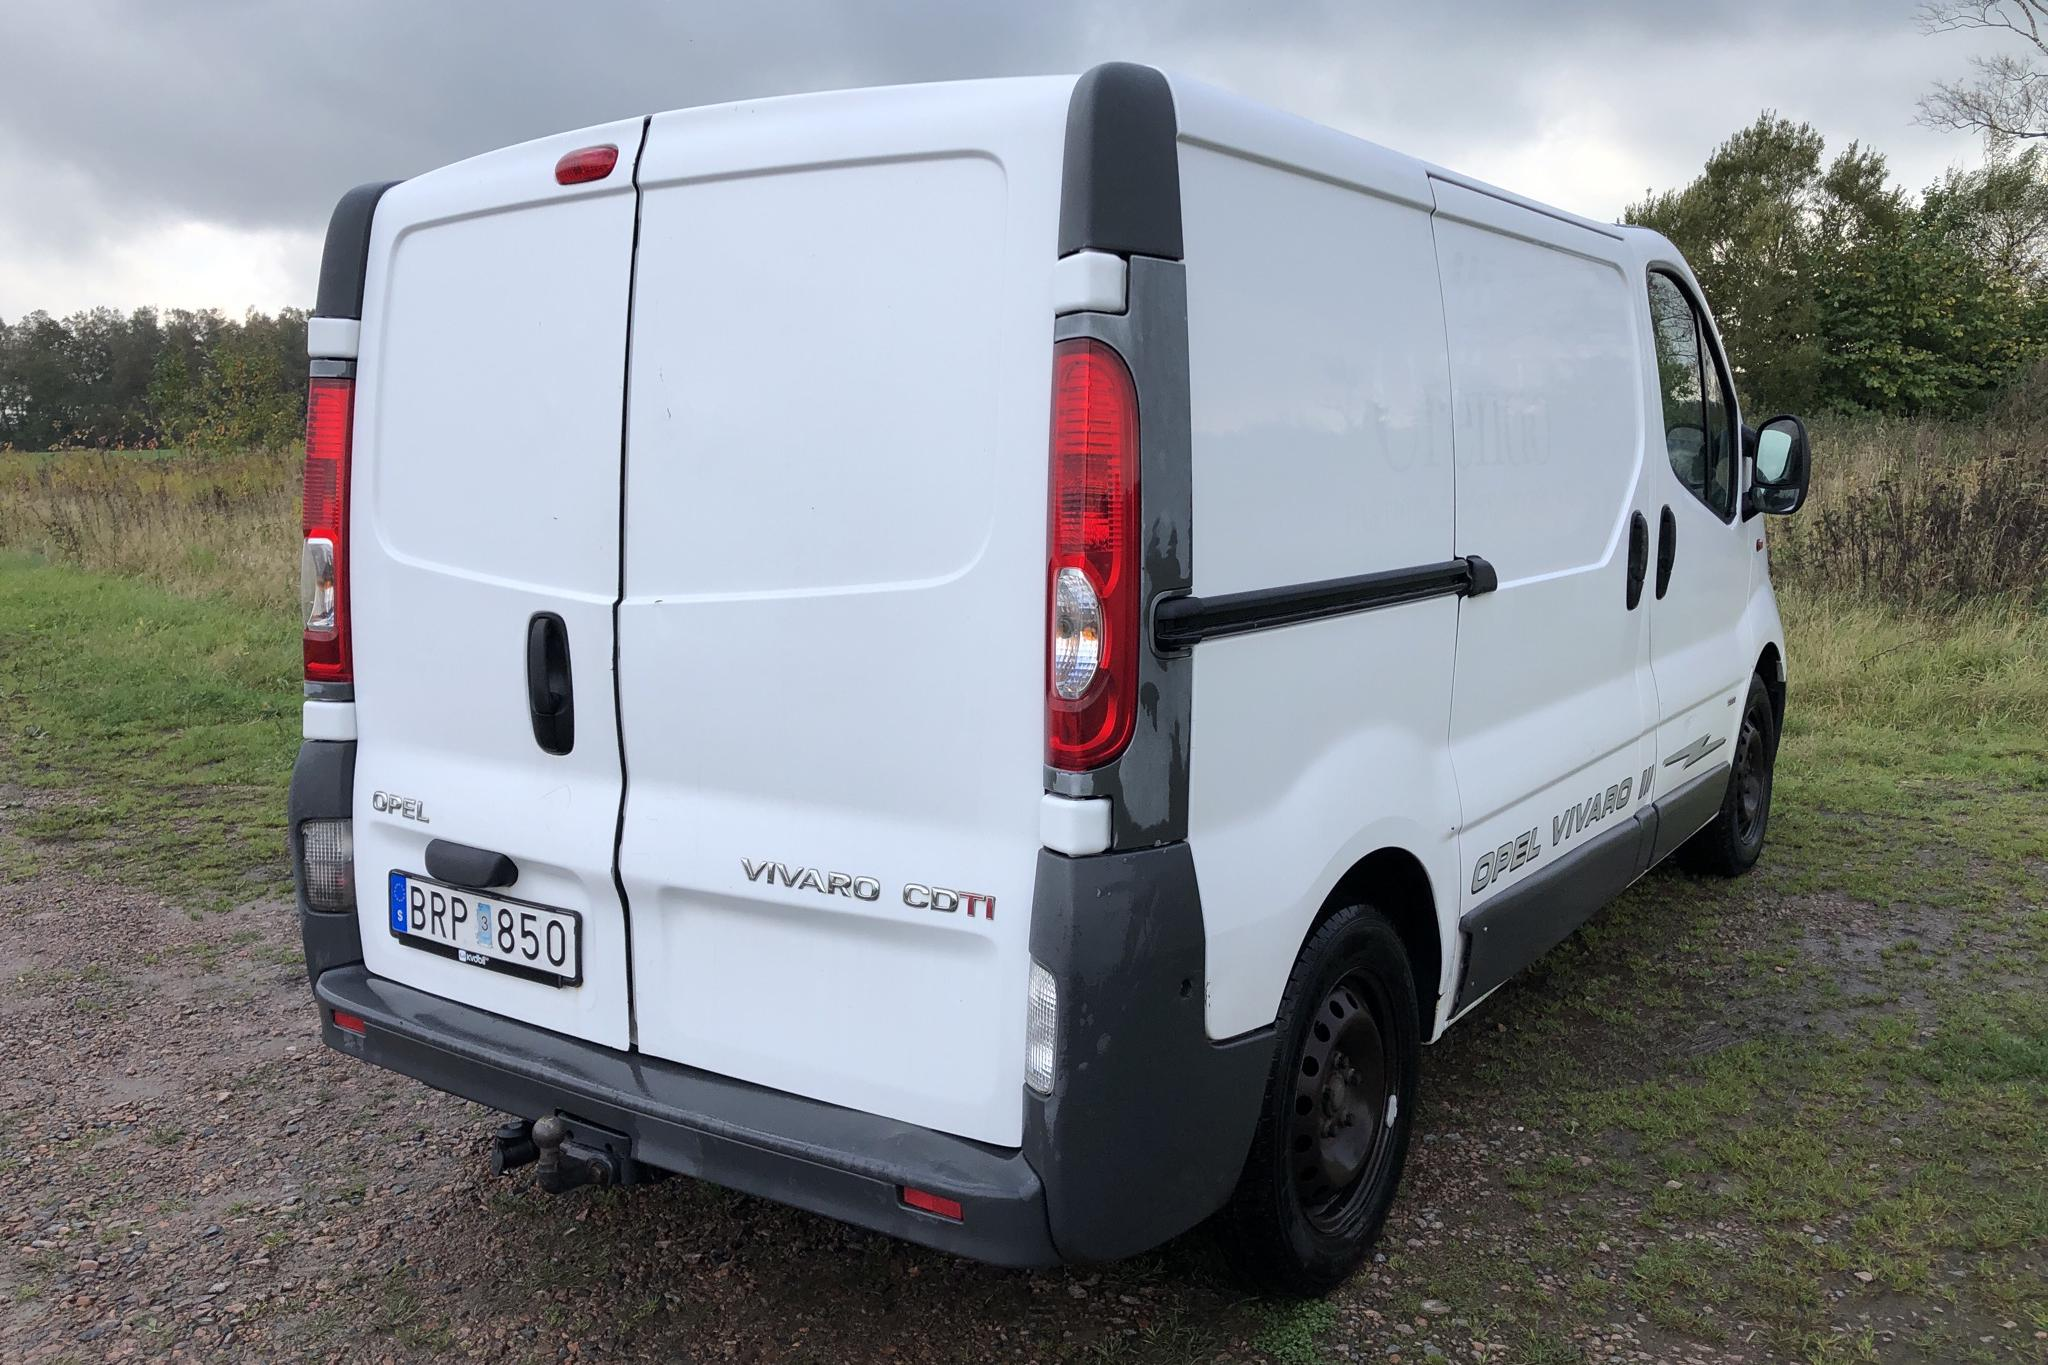 Opel Vivaro 2.0 CDTI (114hk) - 156 620 km - Manual - white - 2008